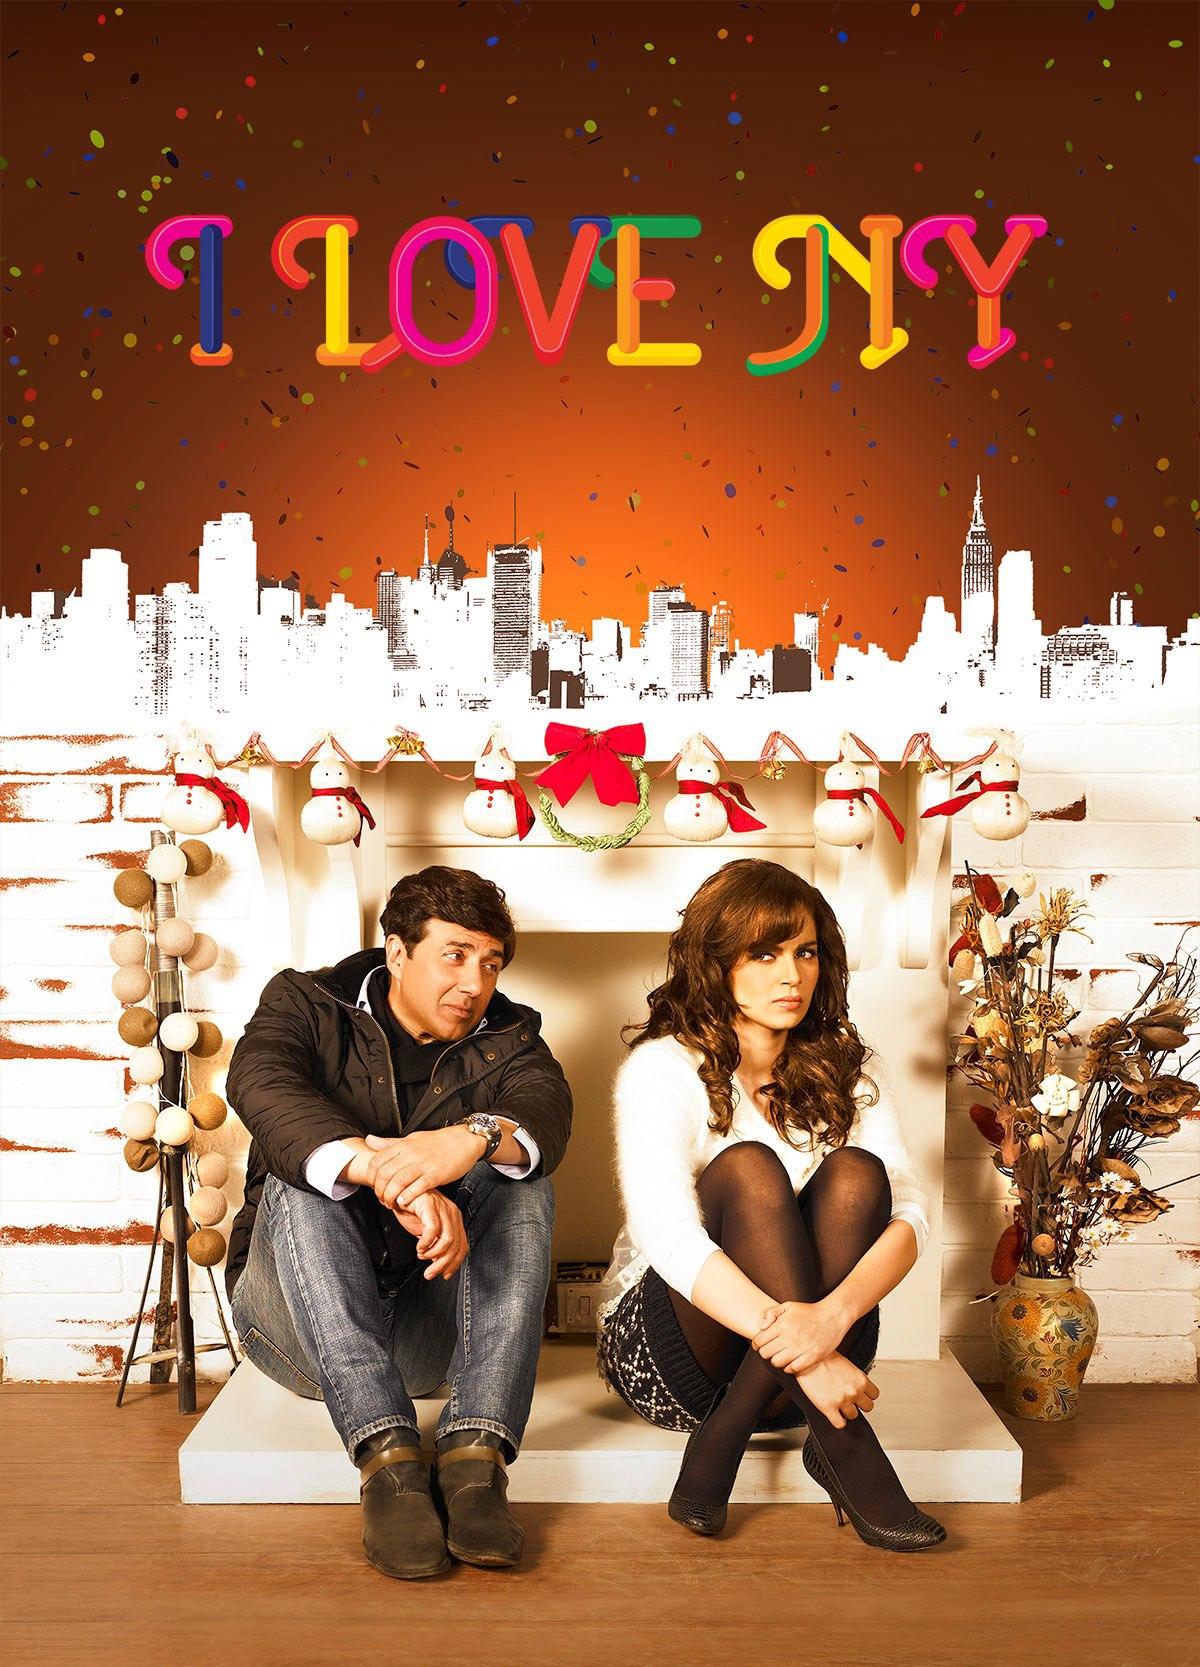 I Love New Year - Movie Poster #3 (Original)